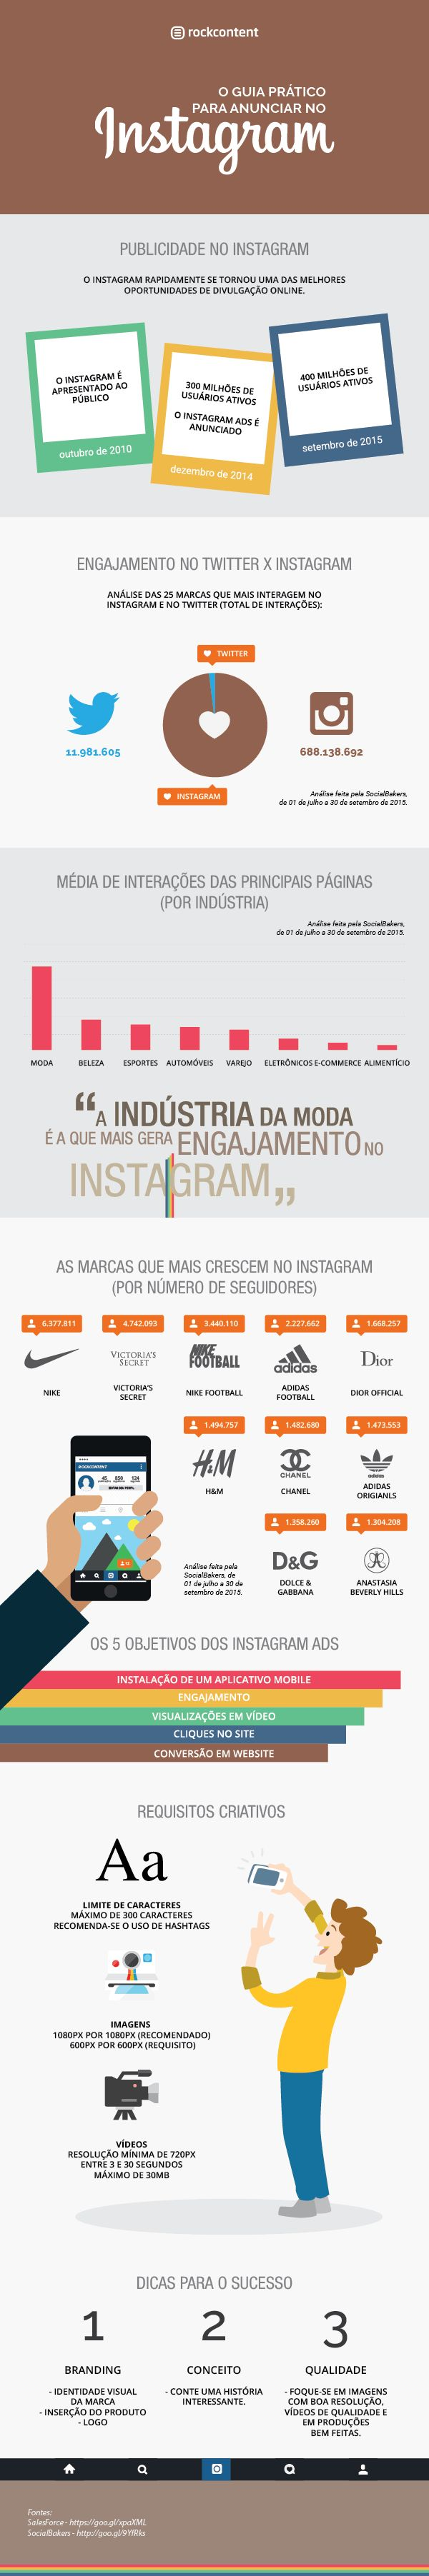 infográfico sobre o instagram